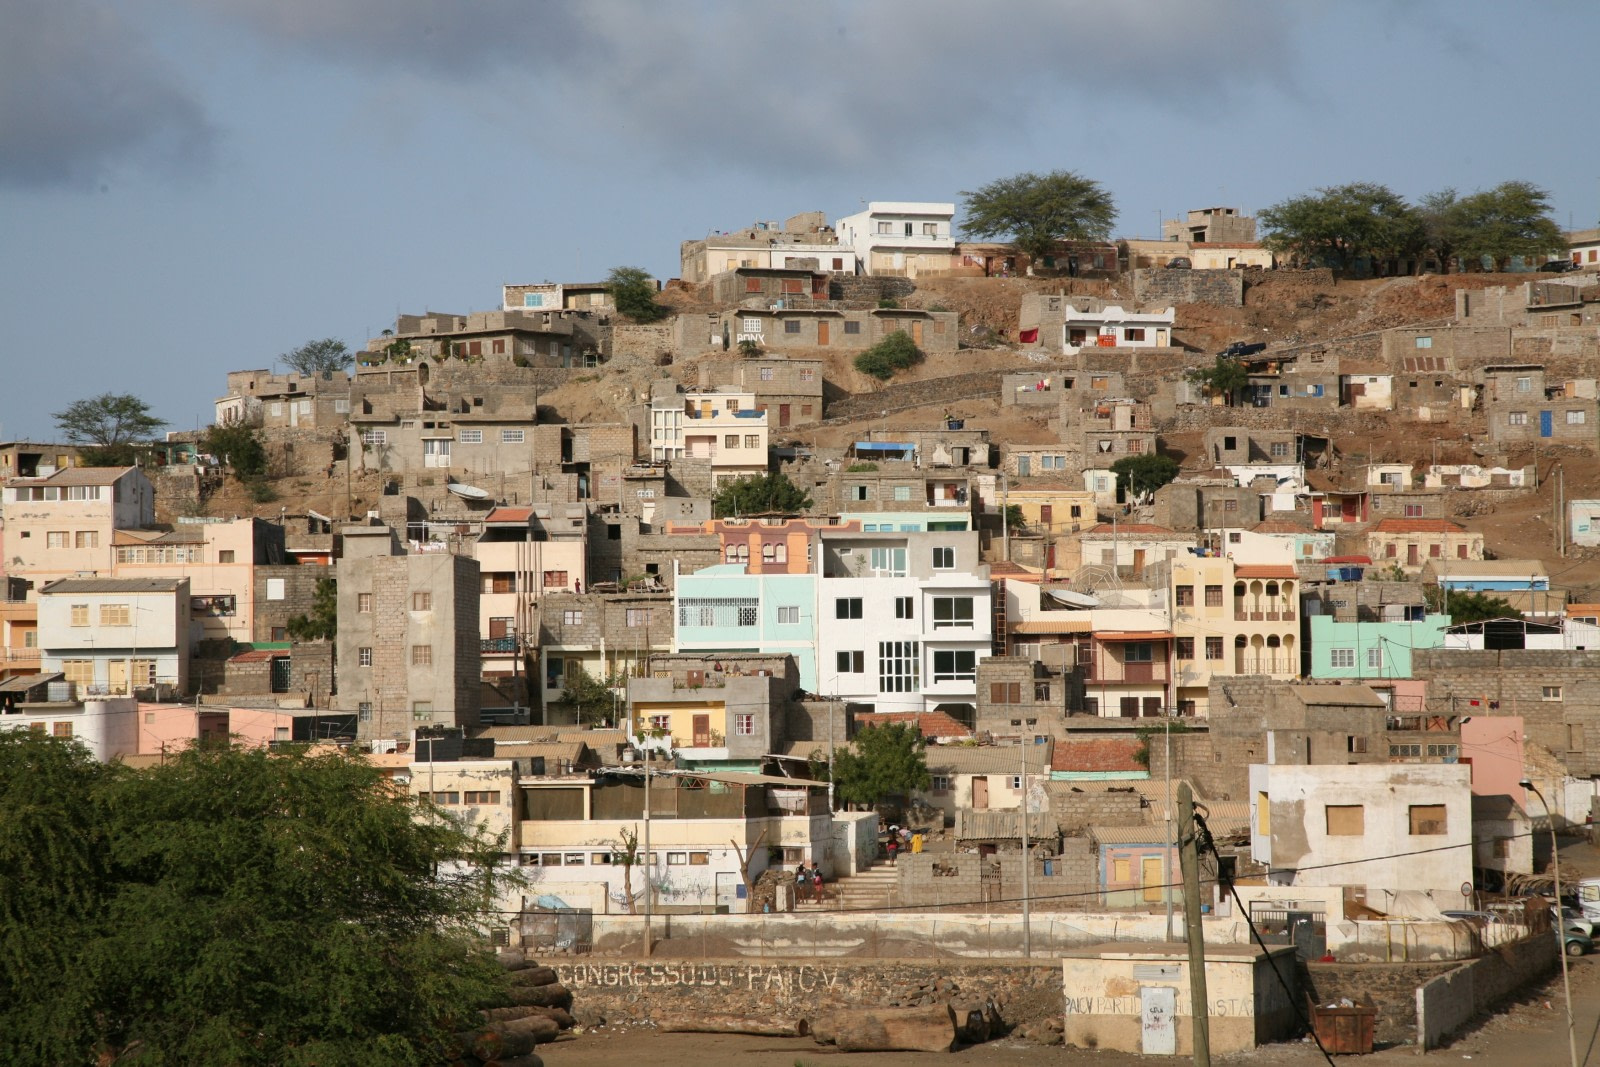 The Cape Verde Capital of Praia